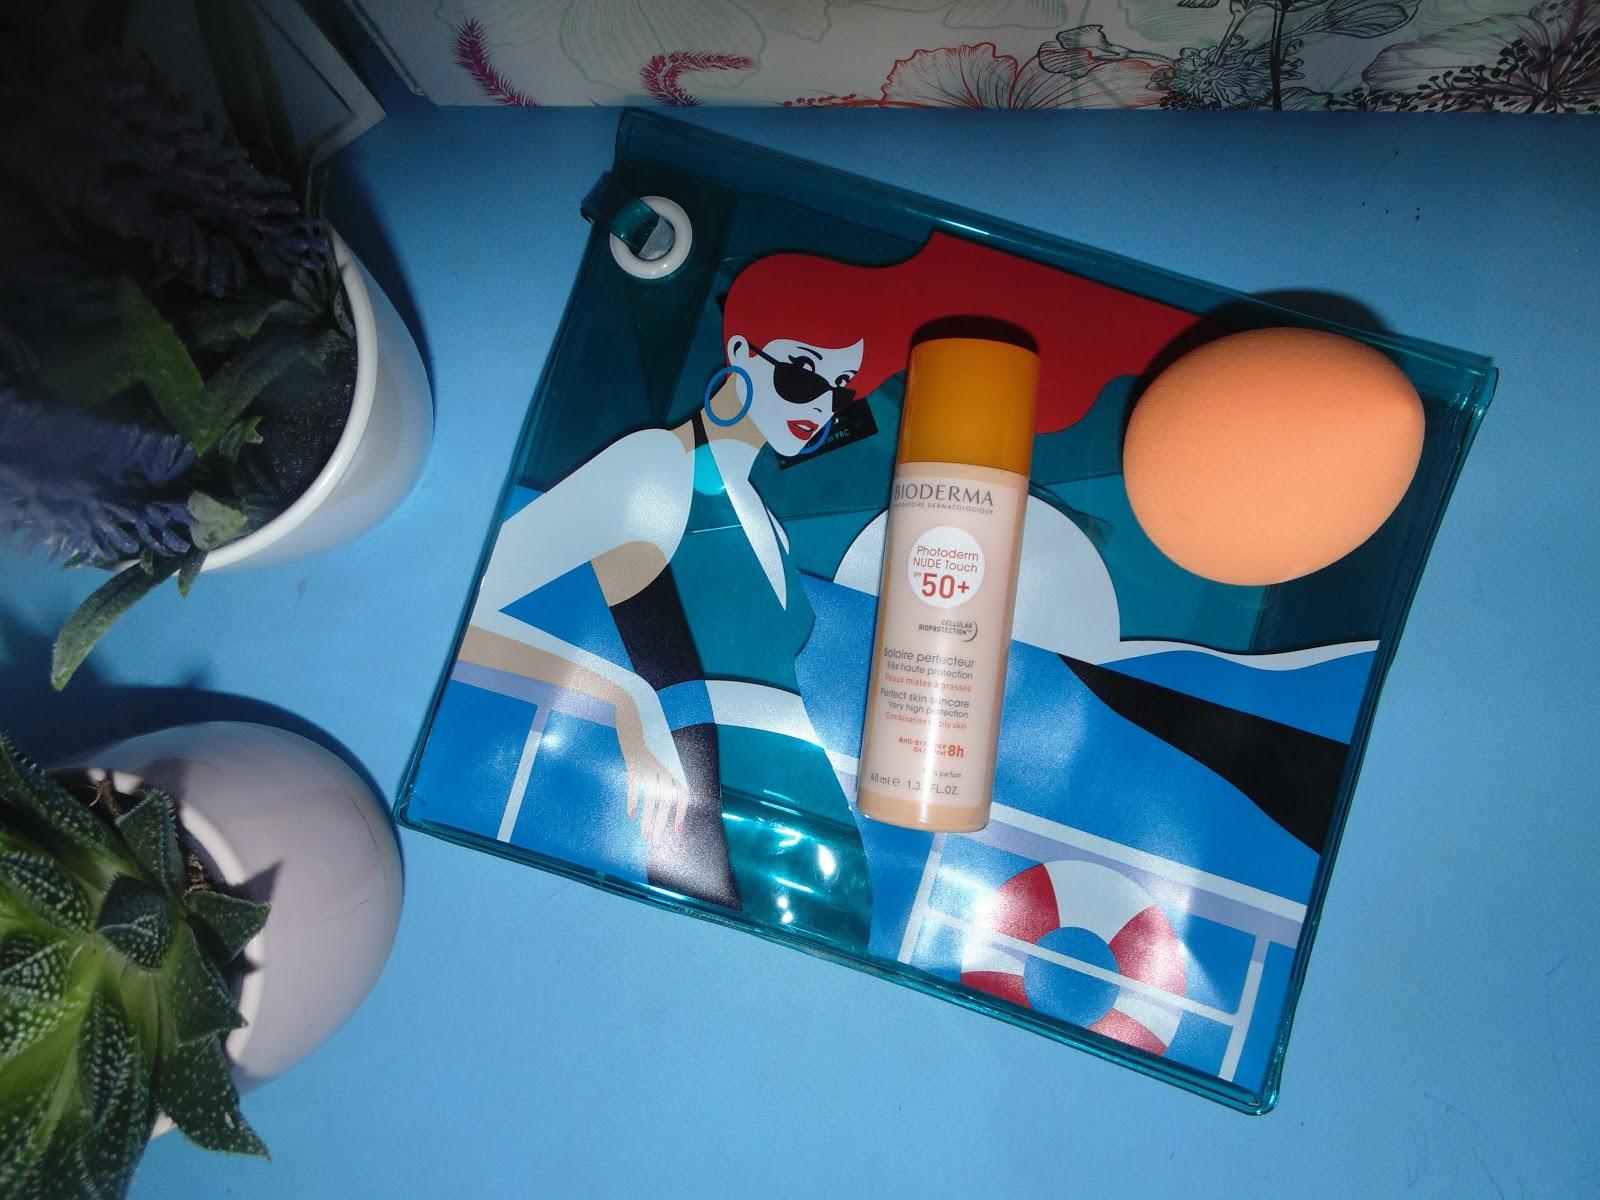 Bioderma Photo Nude Touch z filtrem SPF 50+- ochronny podkład mineralny z efektem Nude